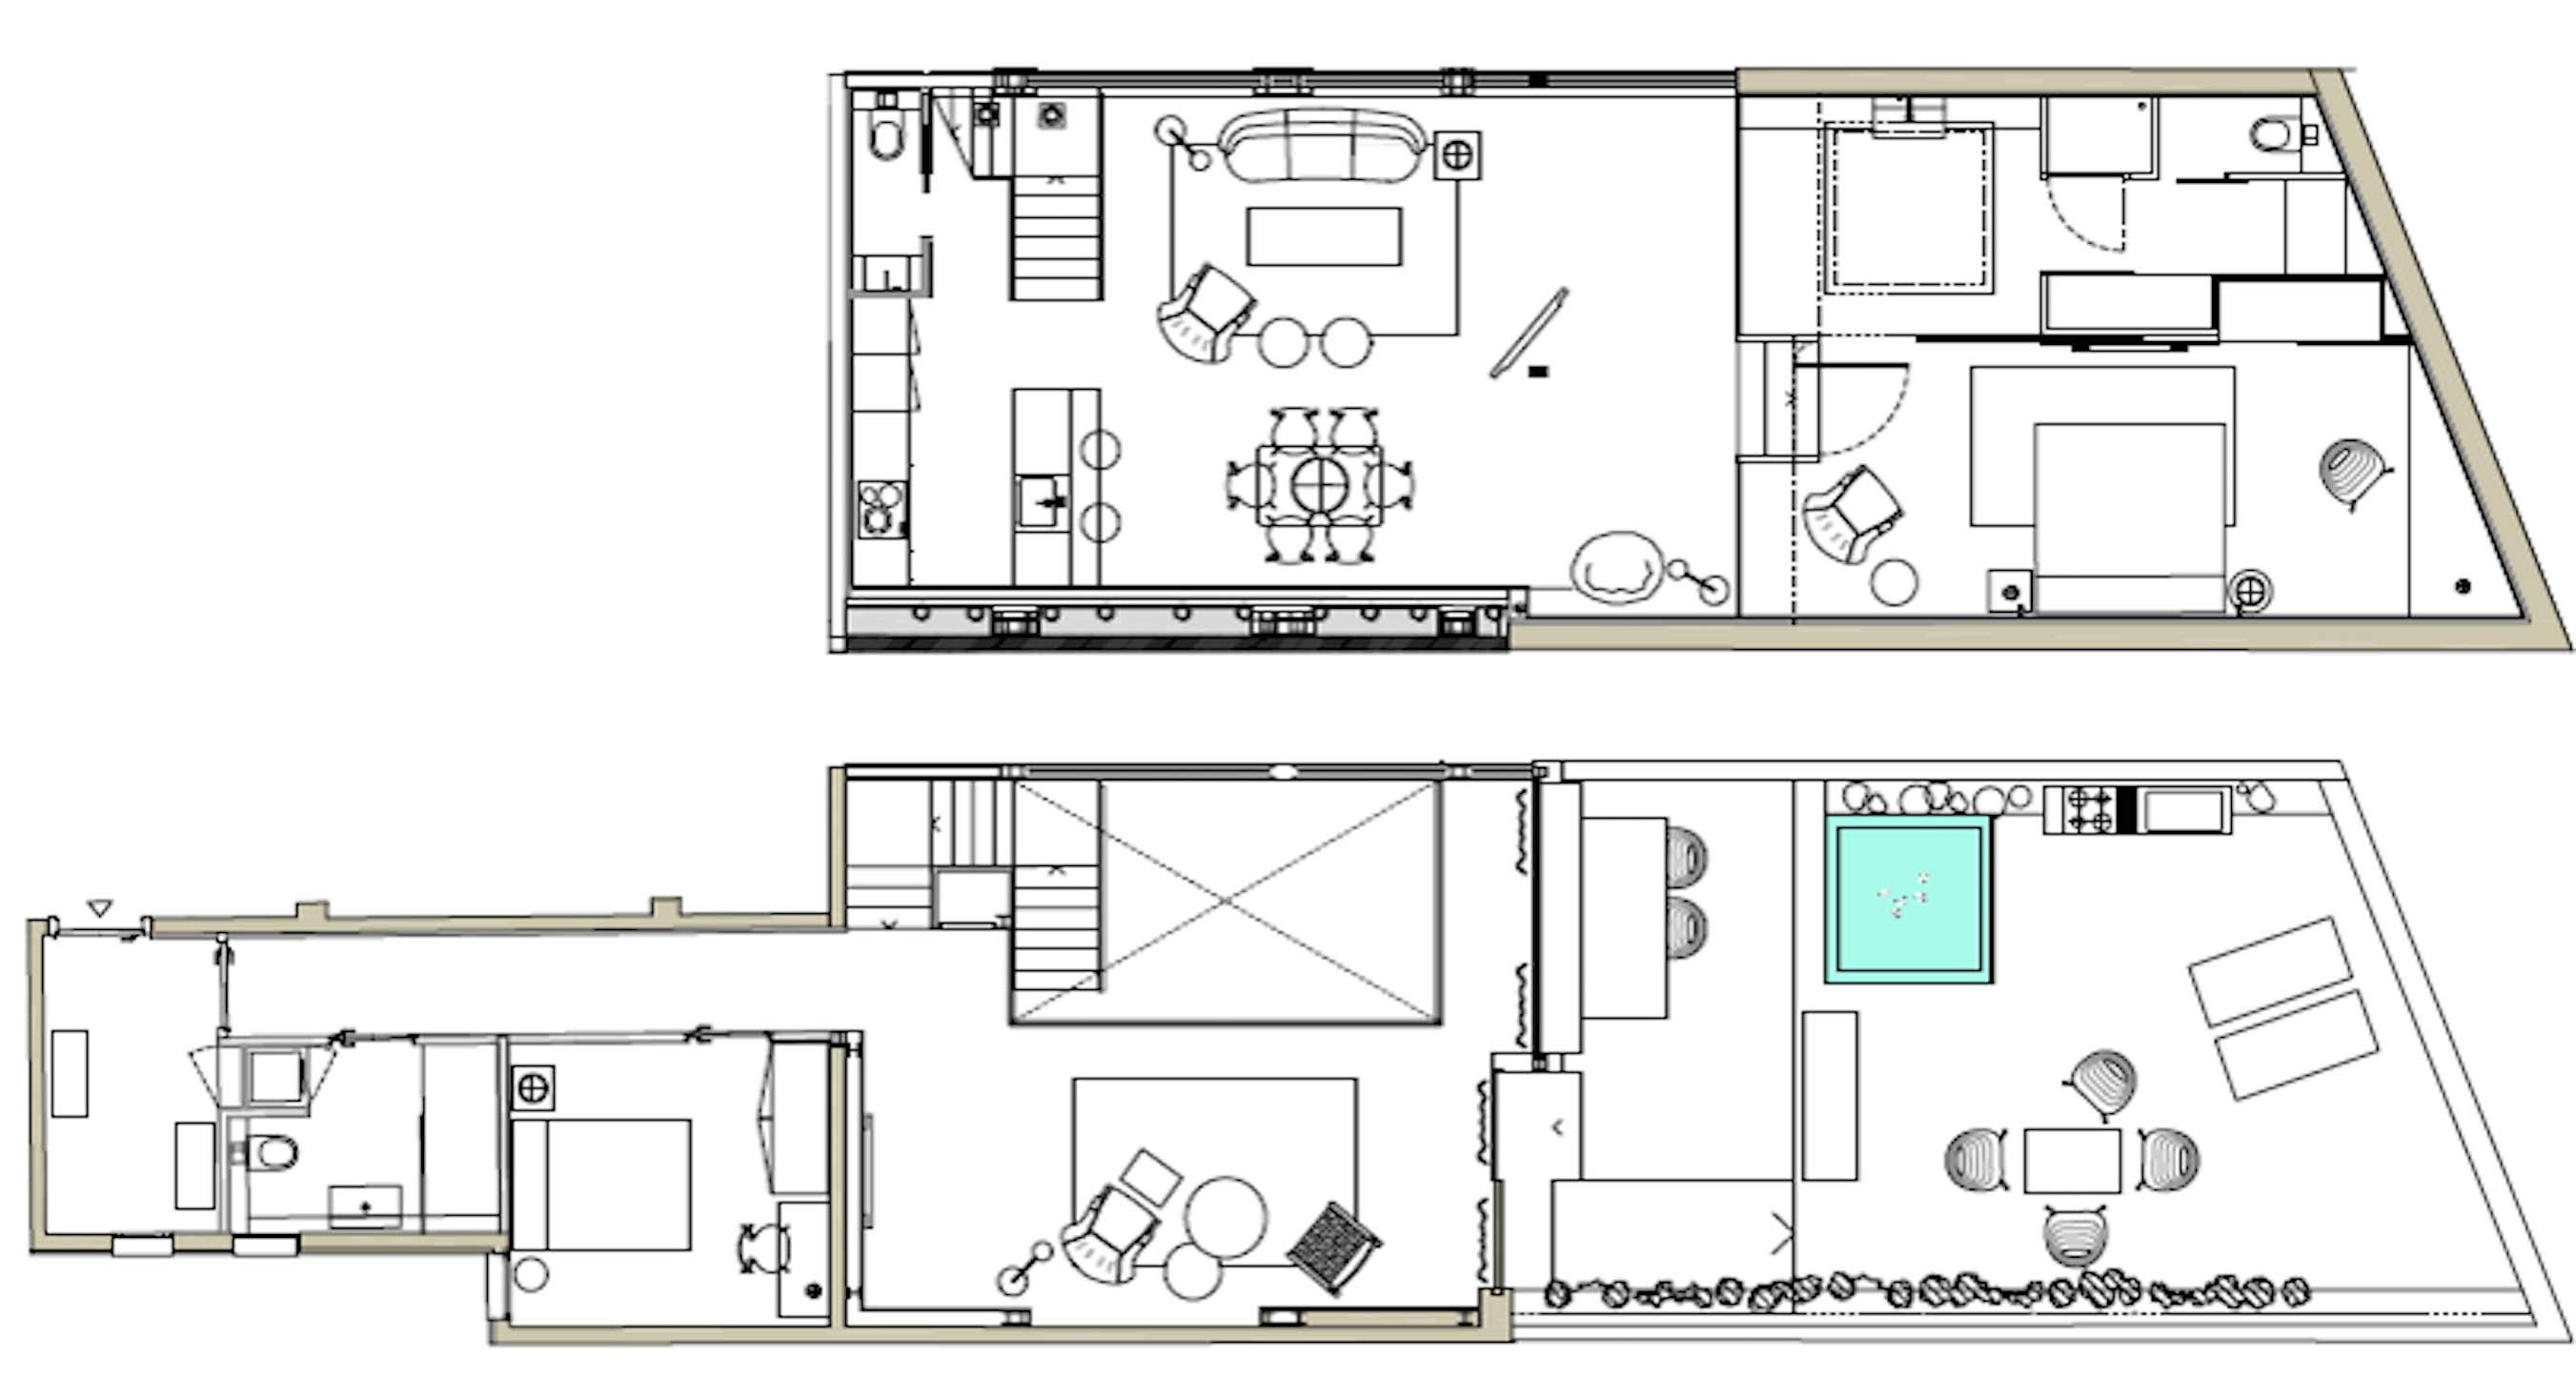 Apartment Luxury Apartment 2 bedrooms Loft 1 photo 23407522